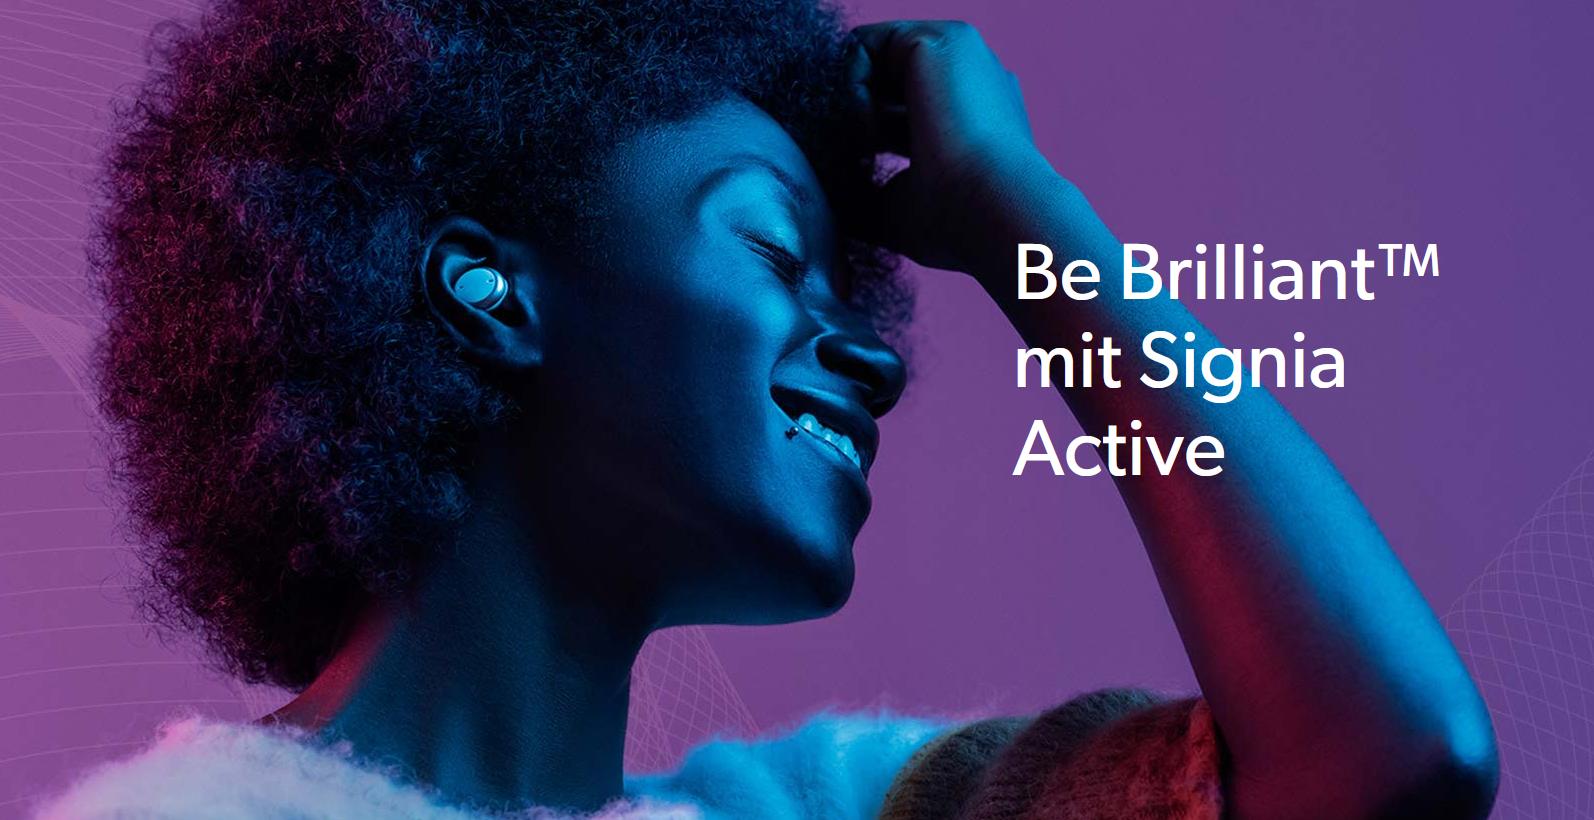 Be Brilliant mit Signia Active 1